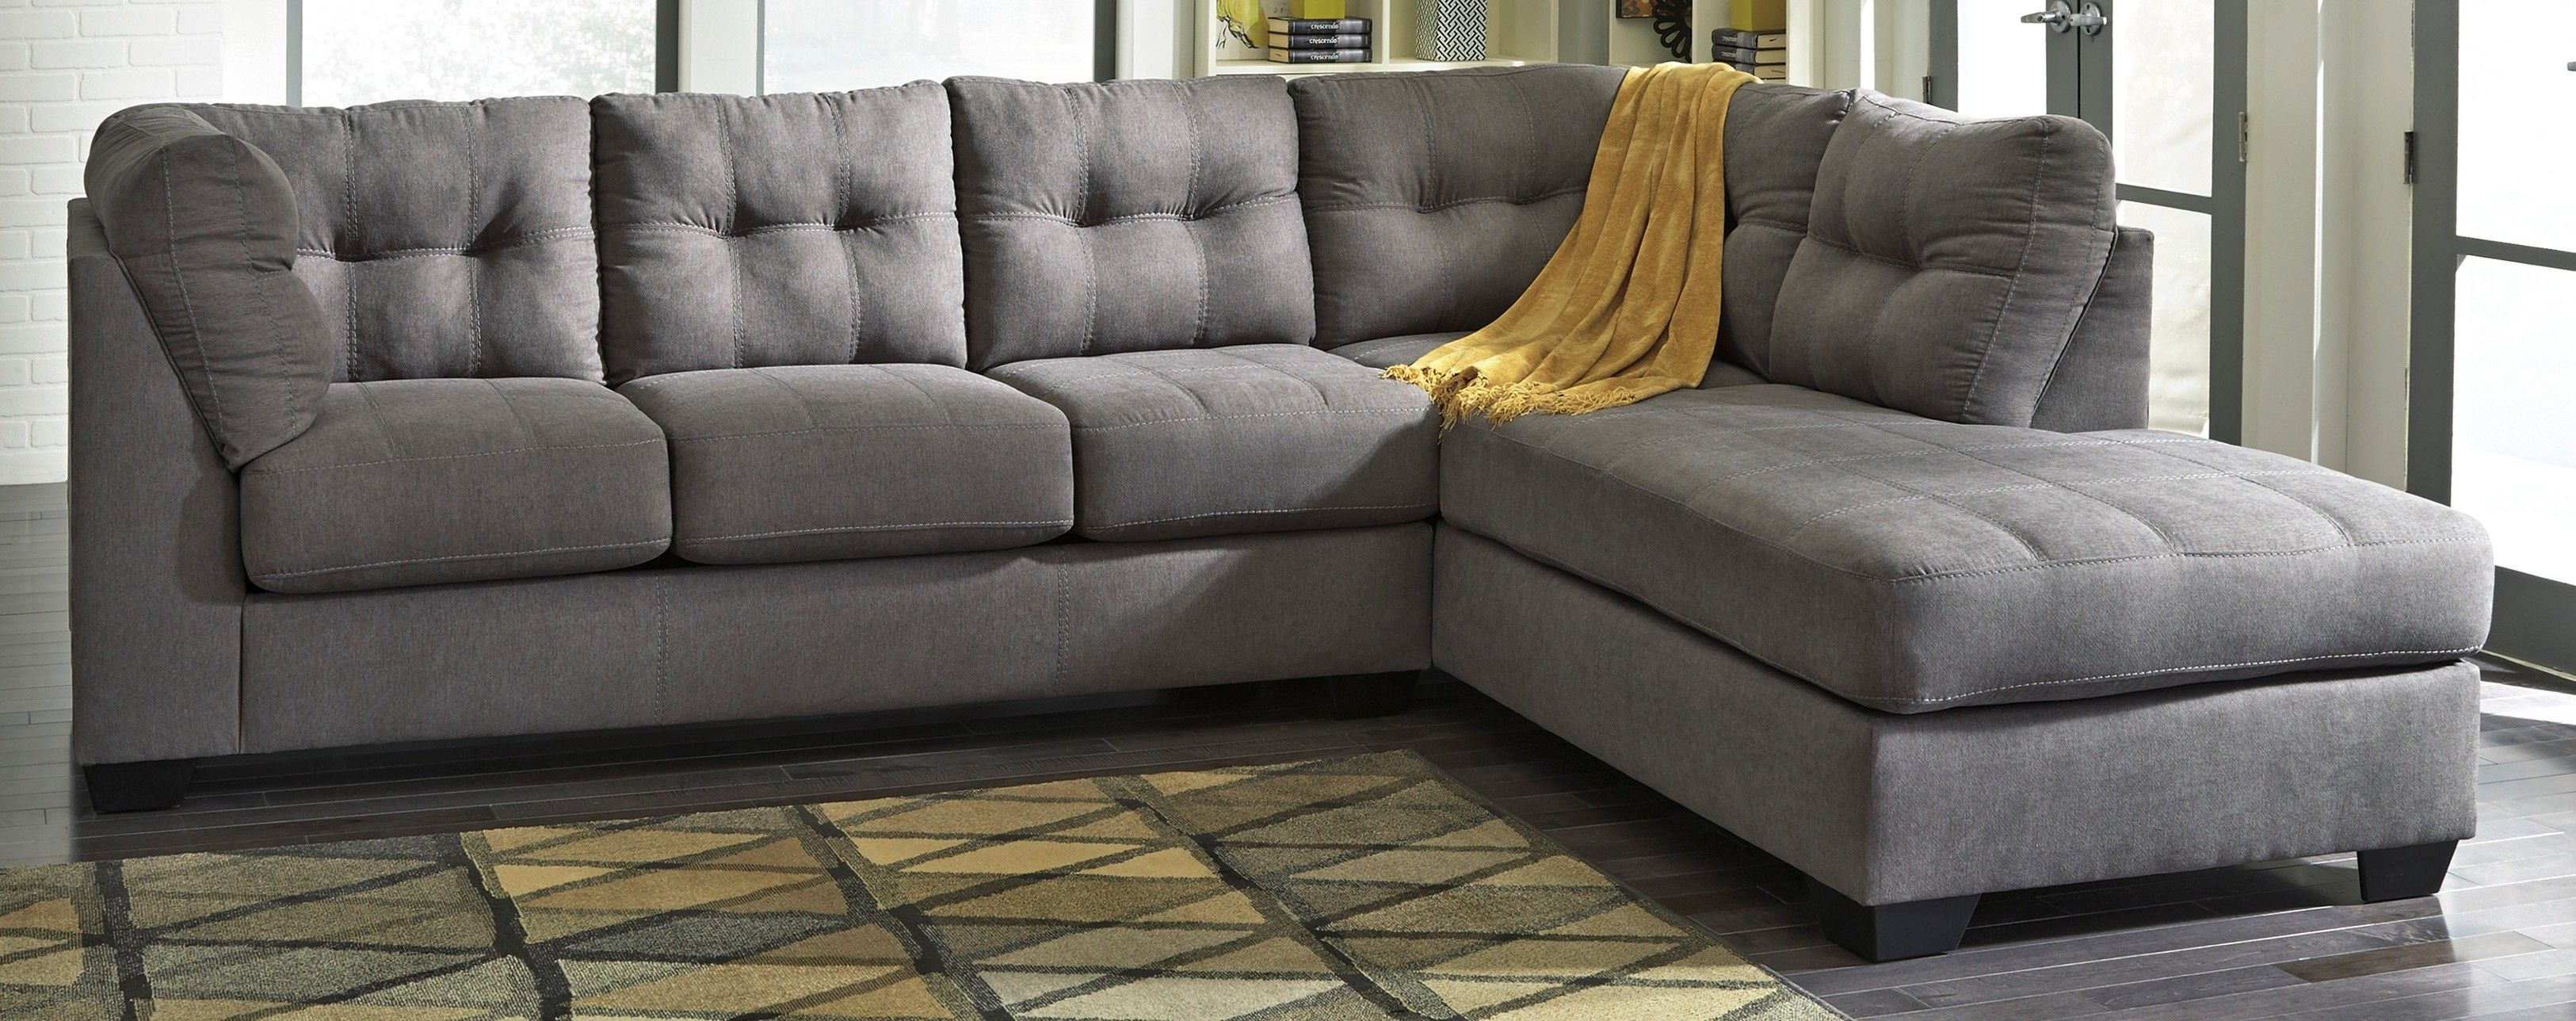 Ashley Furniture Maier Charcoal Raf Corner Chaise Sectional Sectional Furniture Mattress Furniture Charcoal Sectional